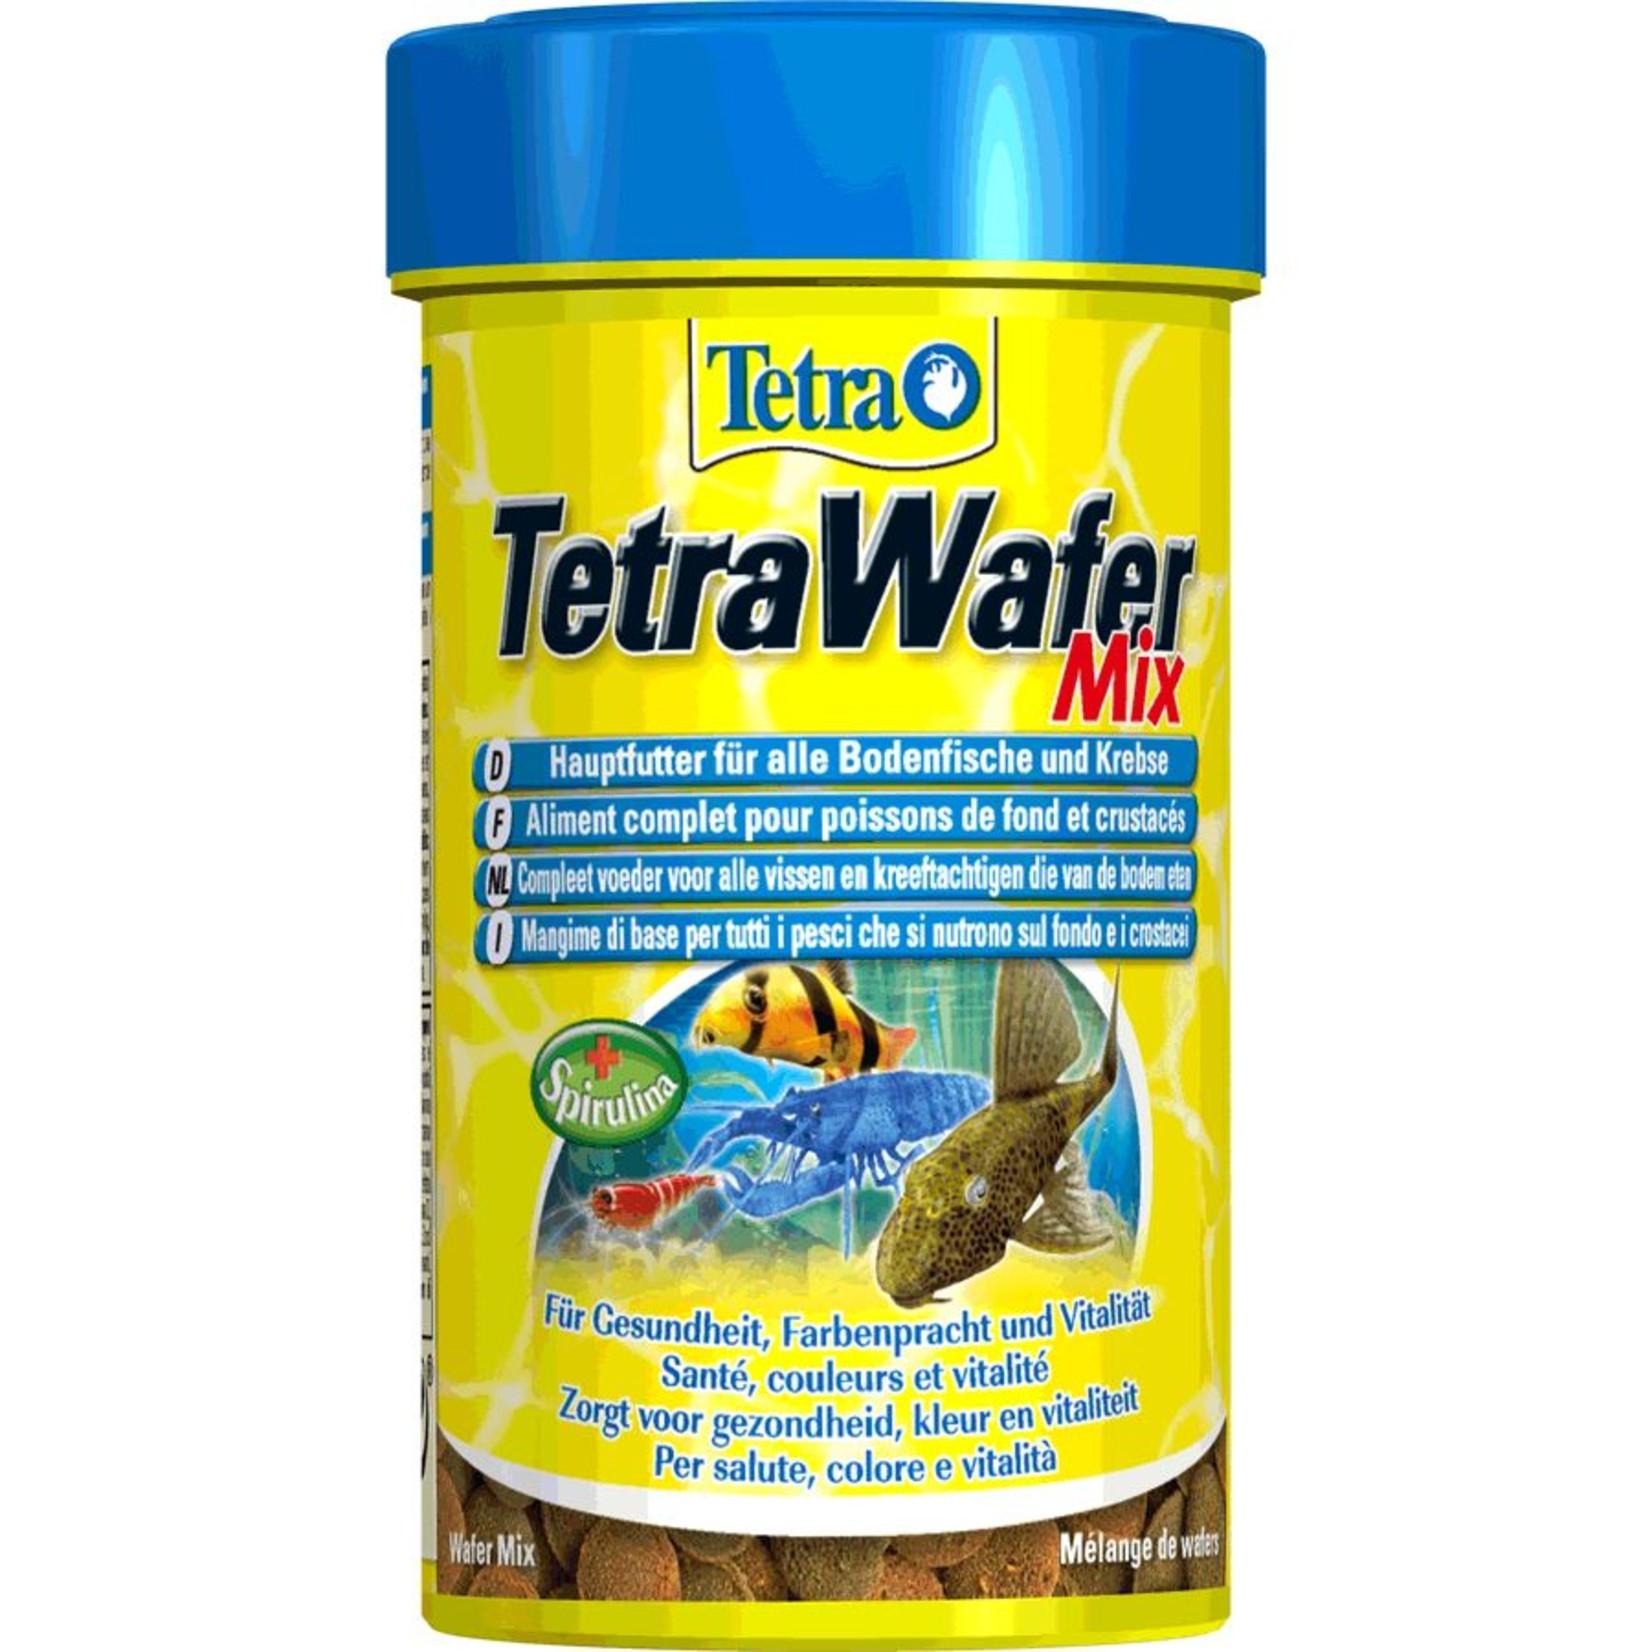 Tetra Tetra wafermix 250 ml